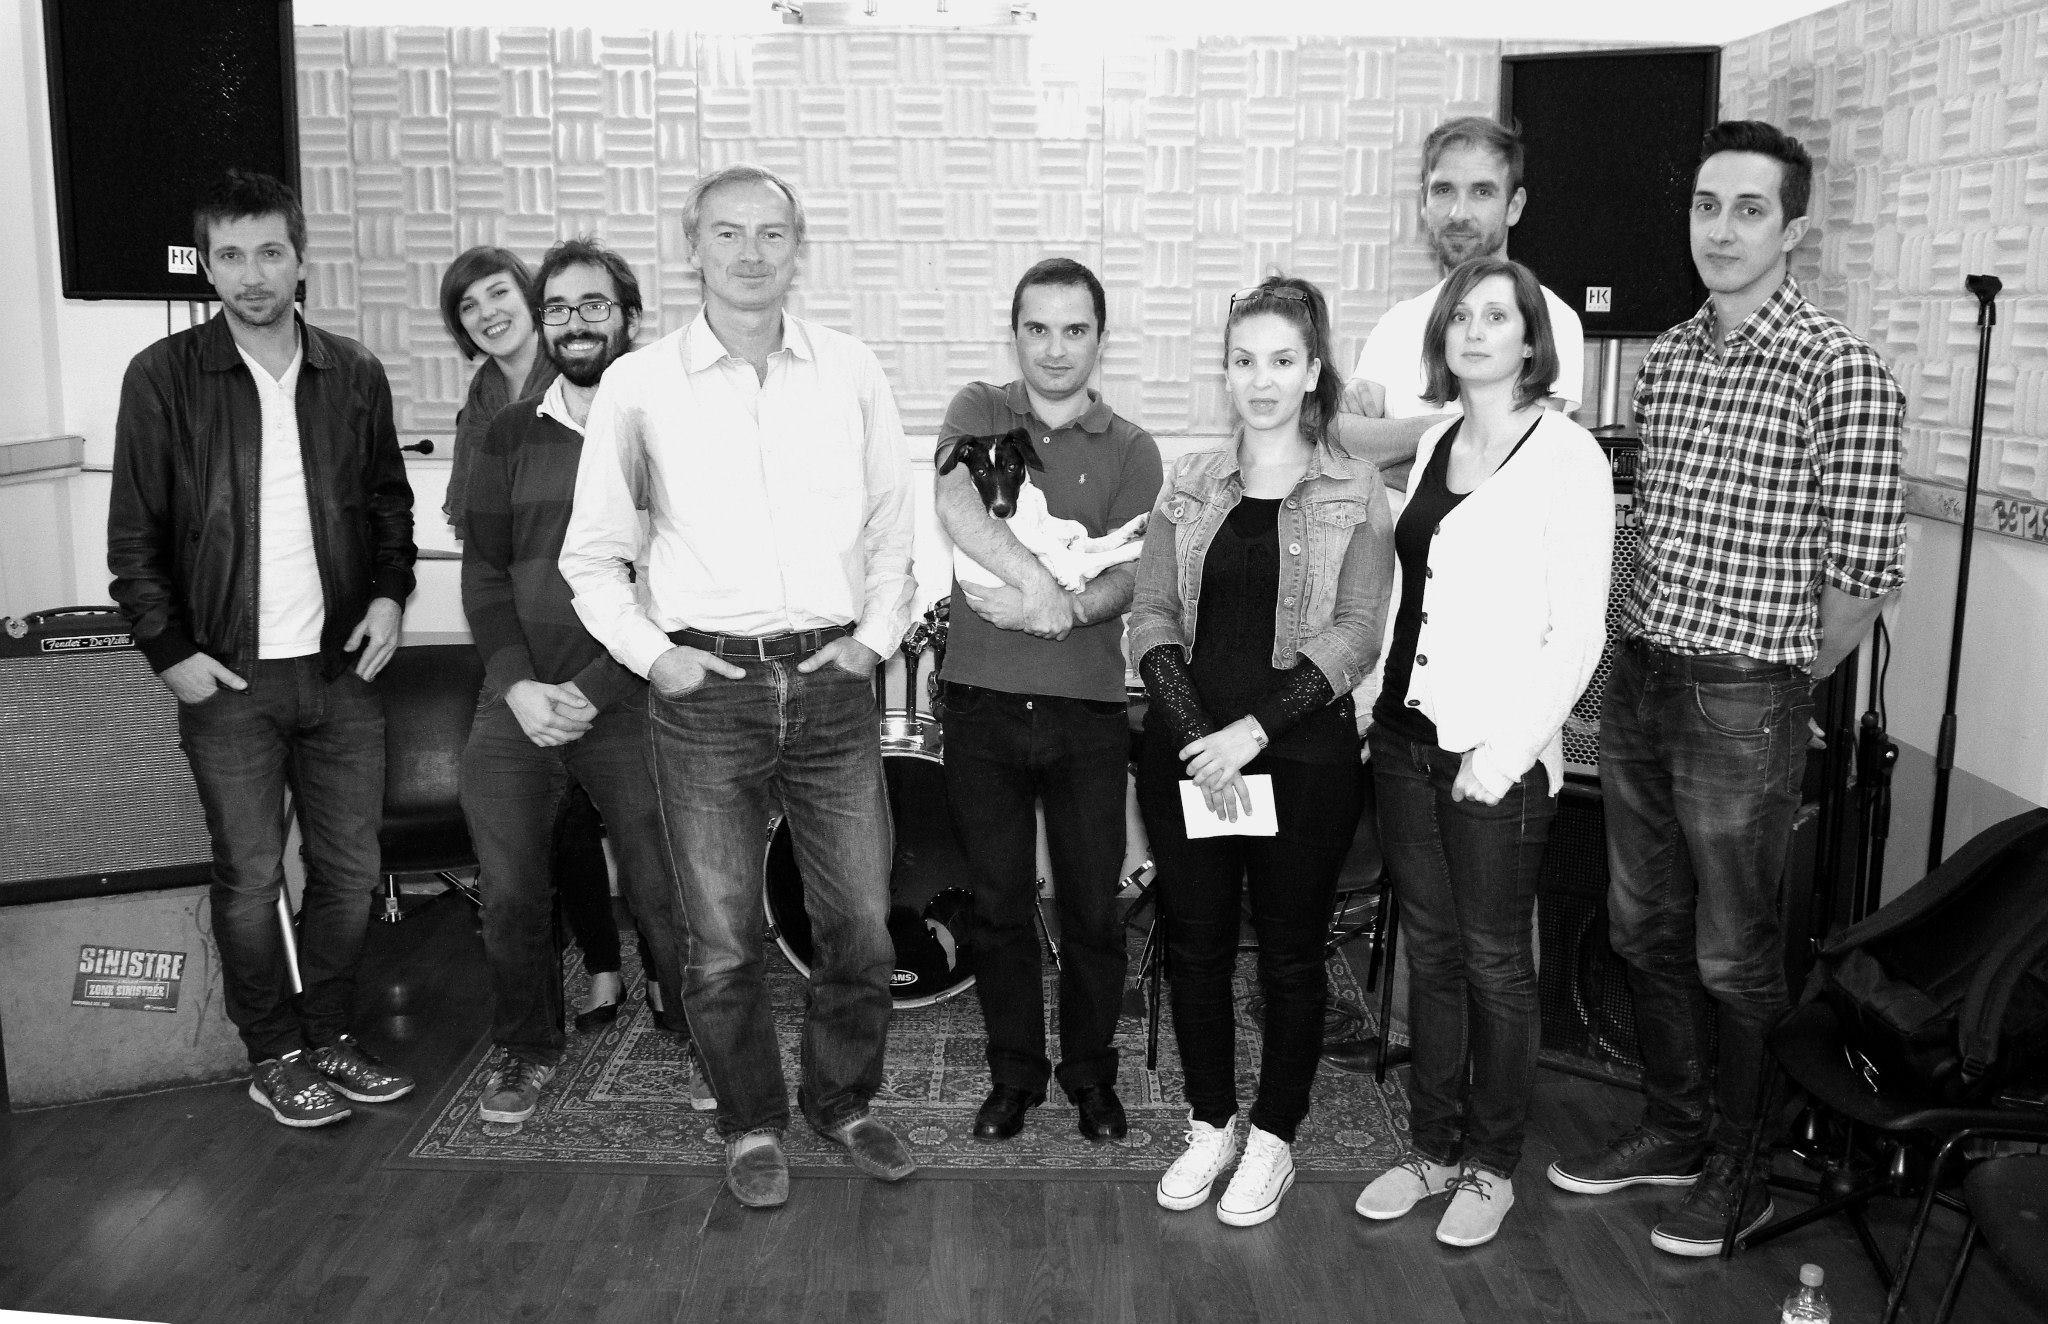 Nicolas Galibert – Président @ Sony/ATV Music Publishing France